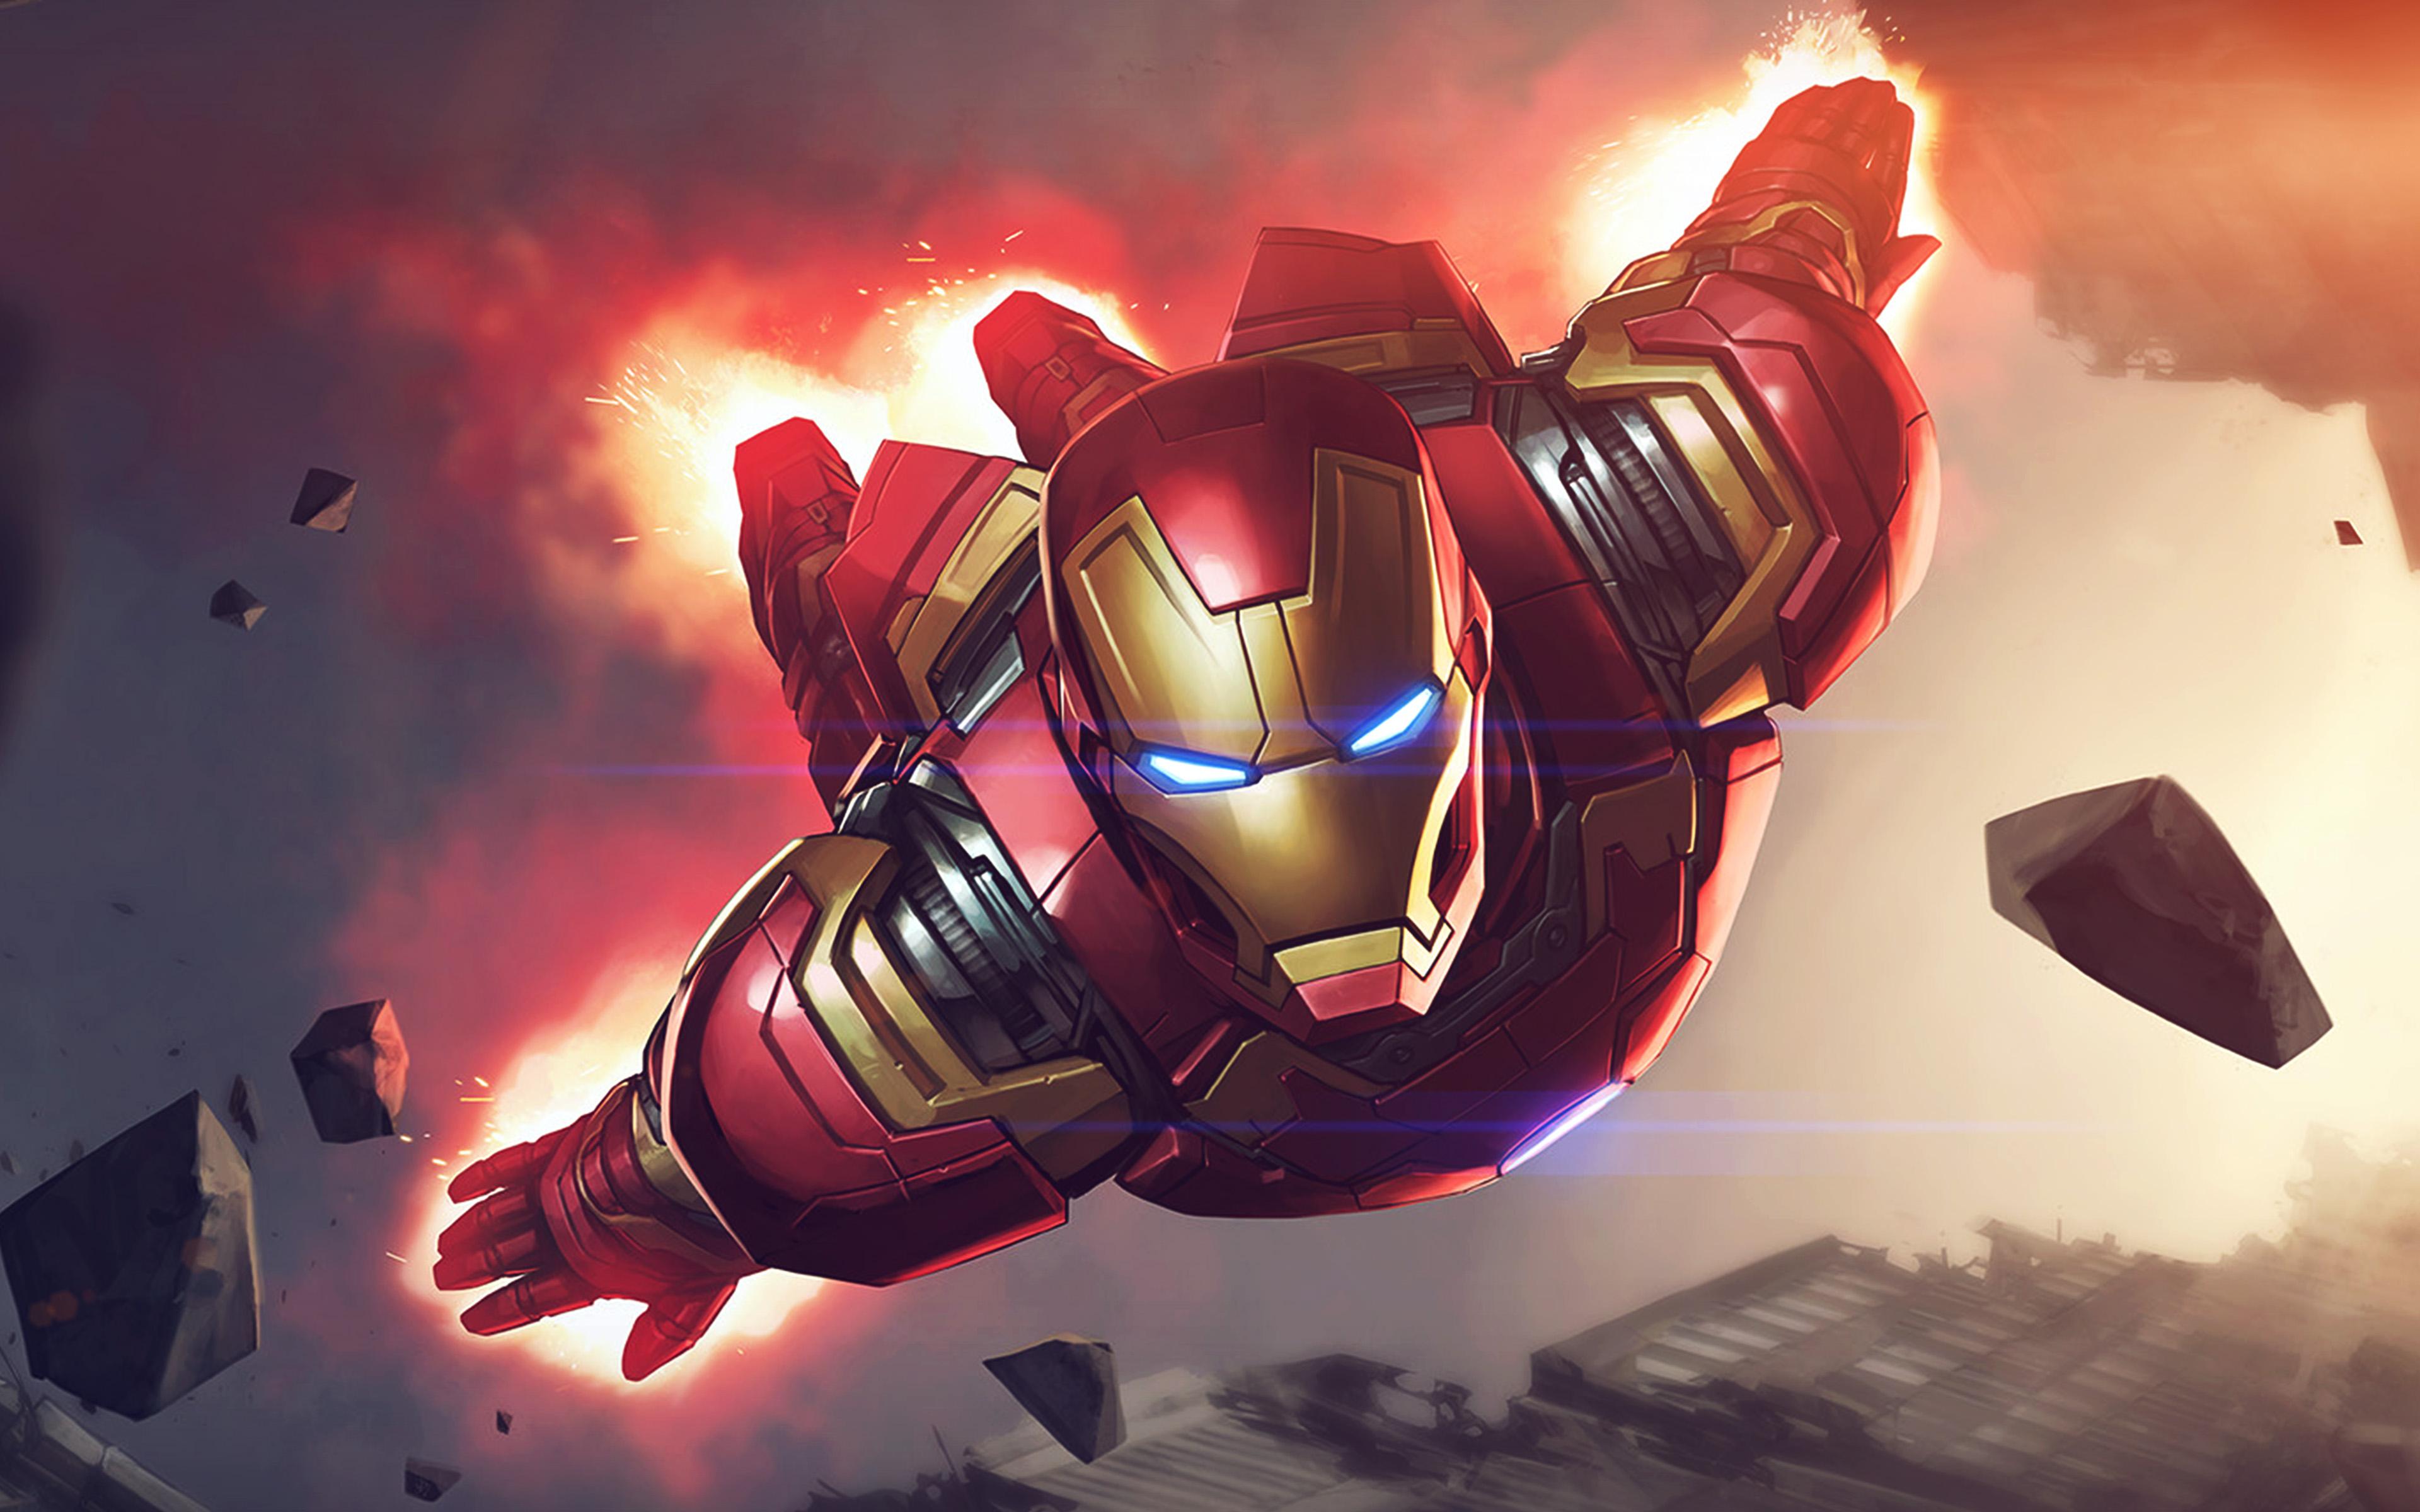 az71-ironman-hero-marvel-illustration-art-blue-flare-wallpaper